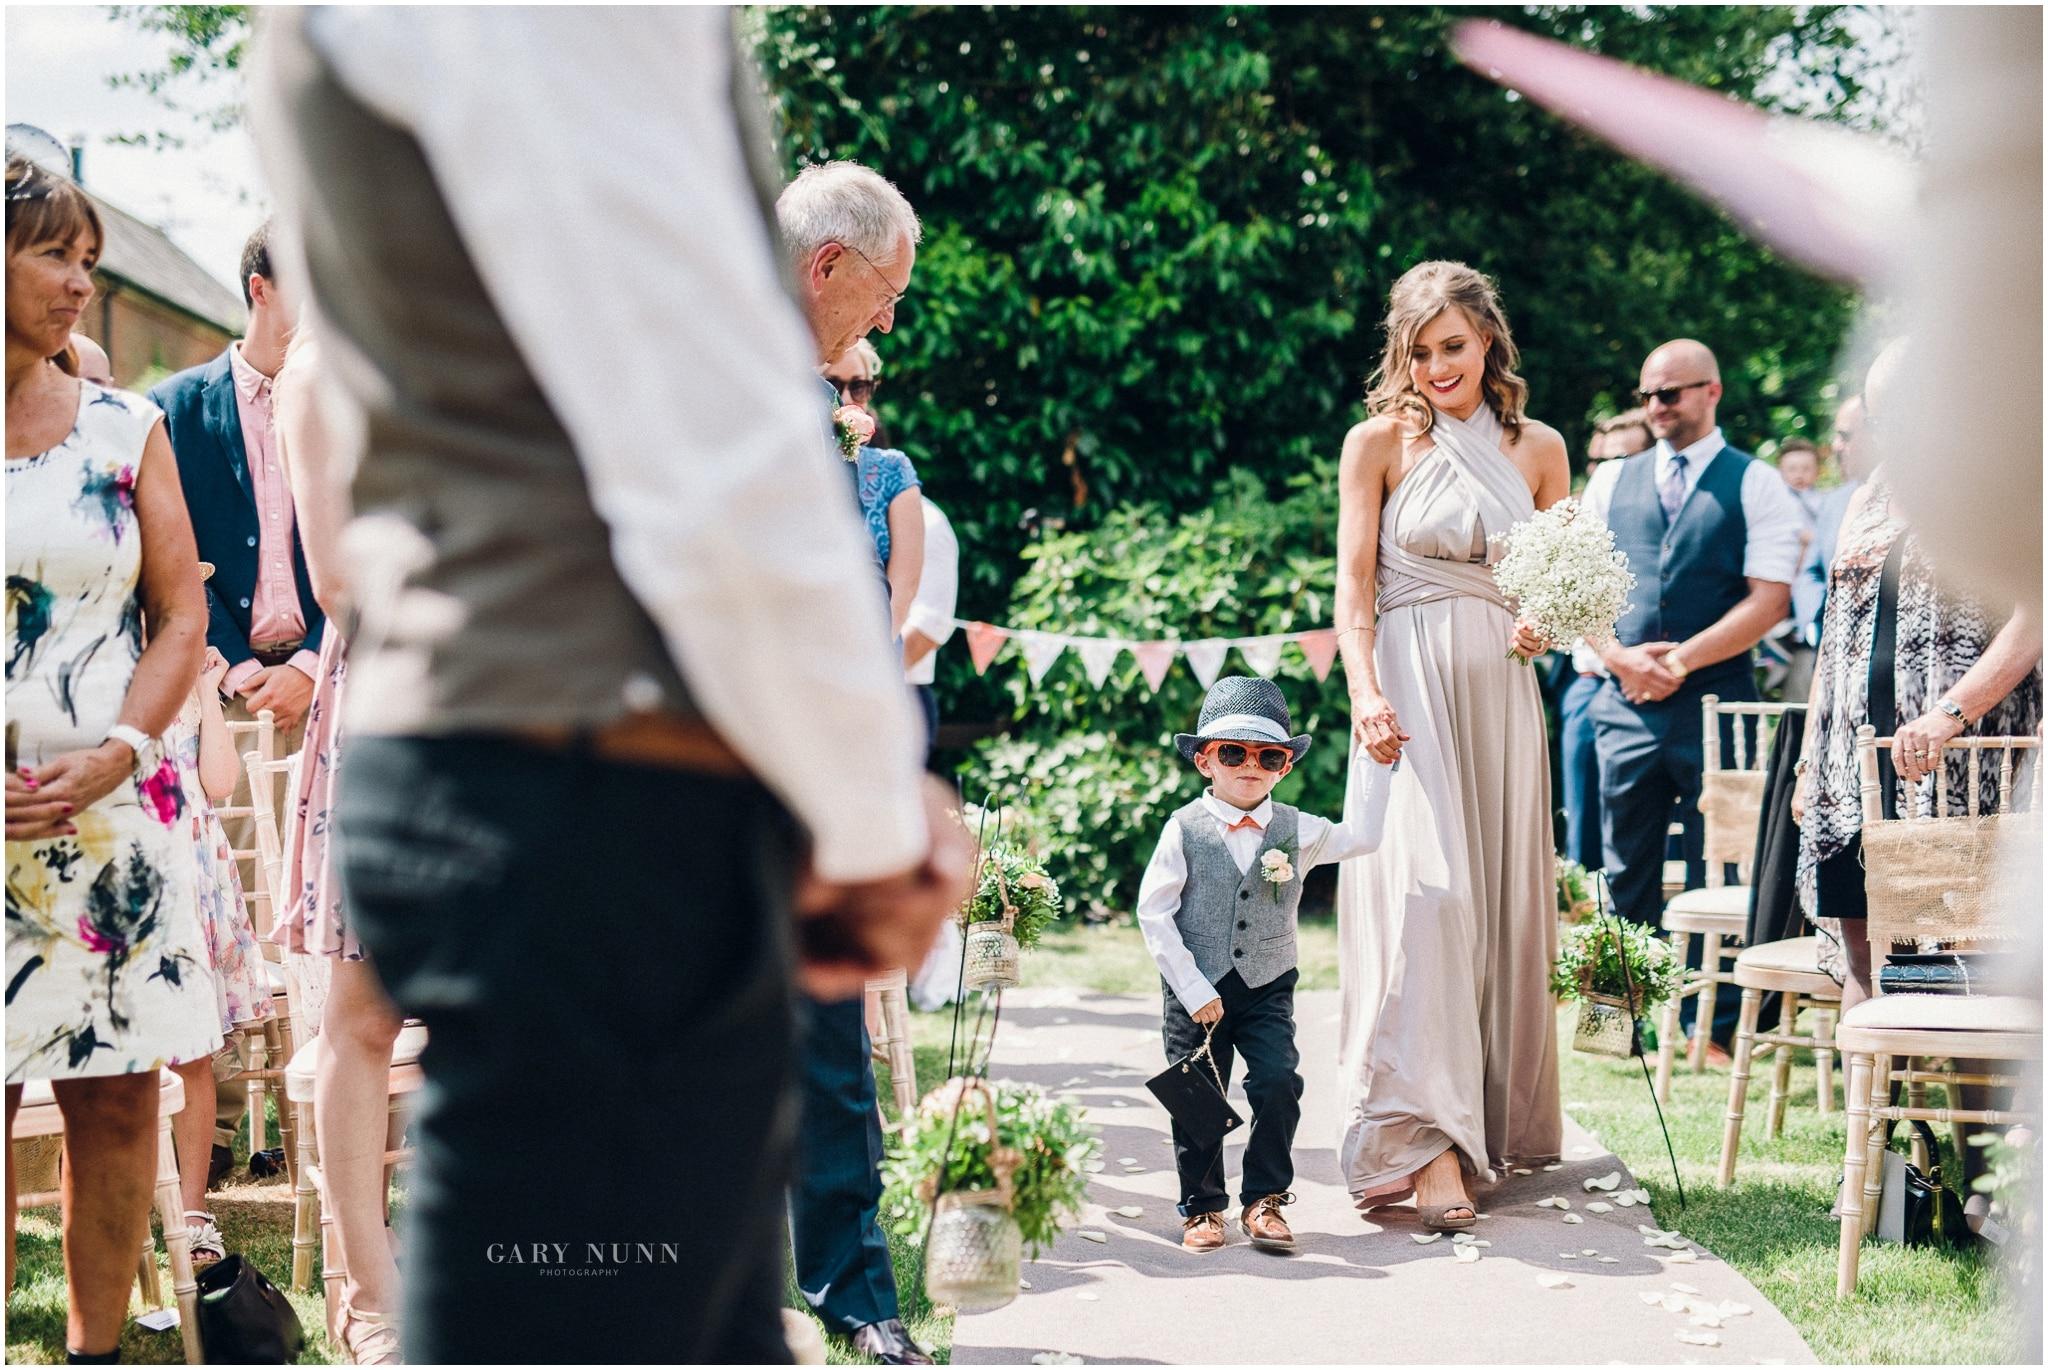 wedding photographer Buckinghamshire, Milton Keynes Wedding Photographer, Wedding Photographer Leighton Buzzard, Destination Wedding Photographer, Buckingham Wedding Photographer